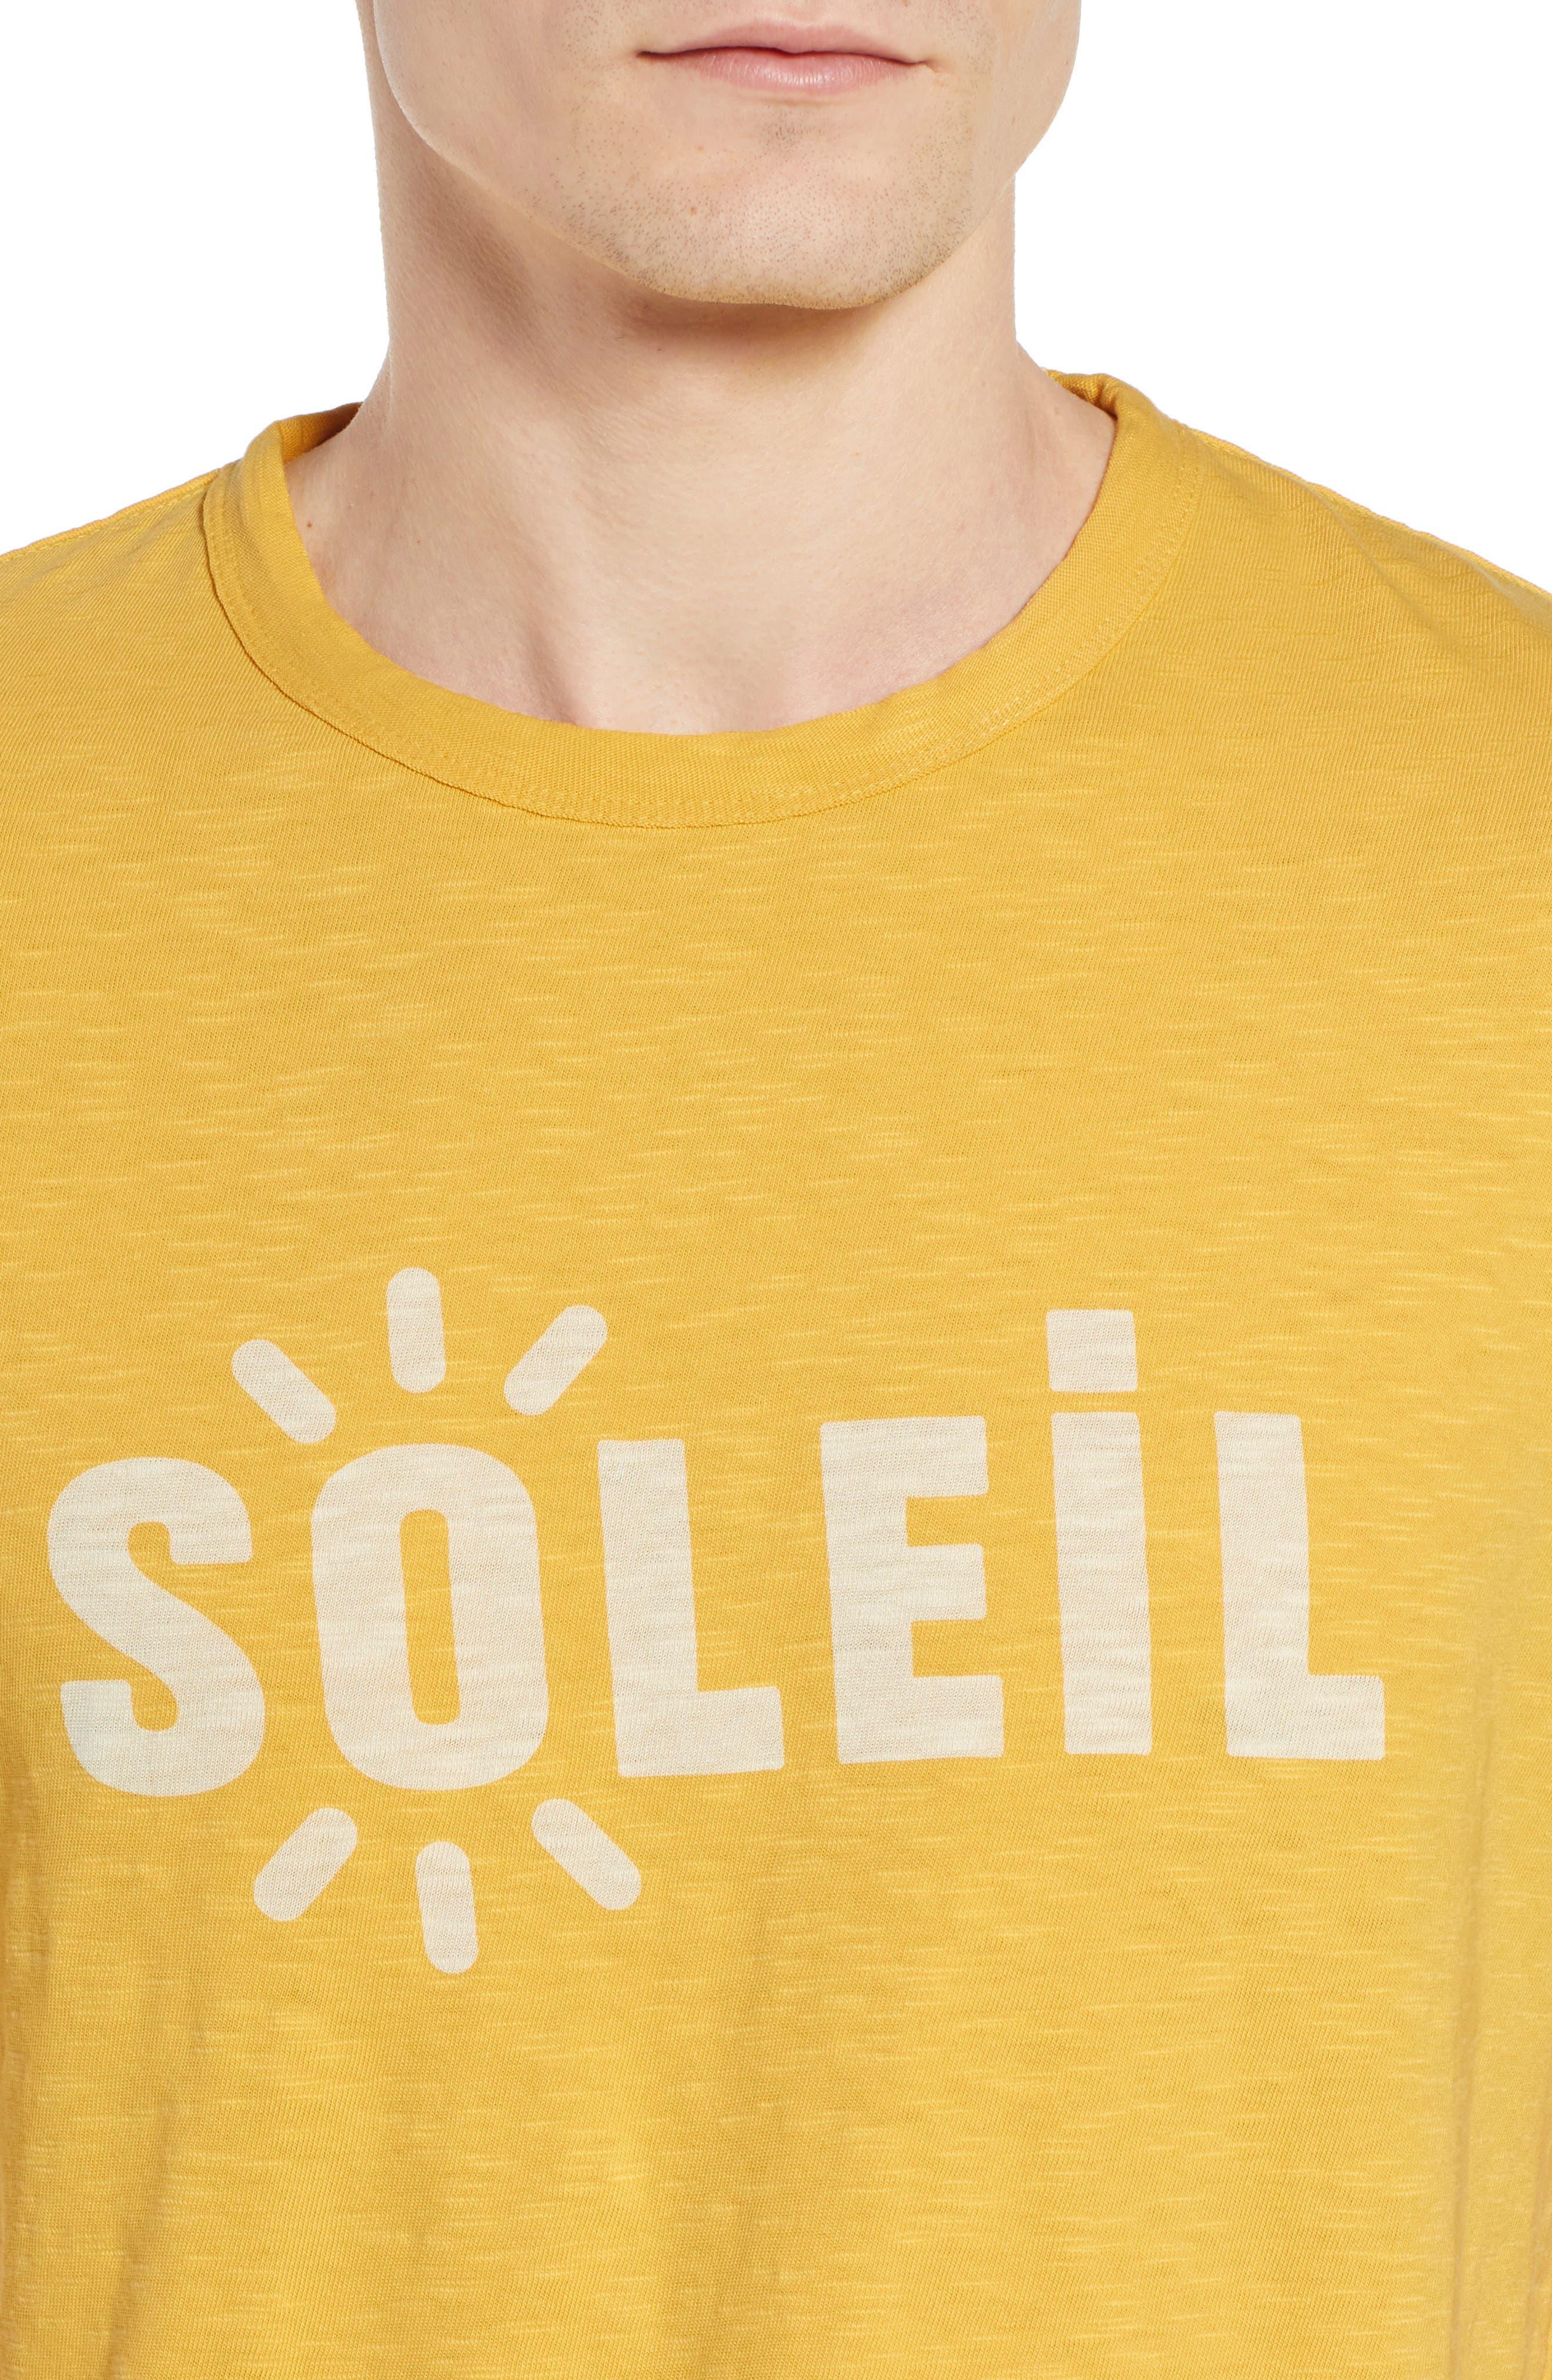 Soleil T-Shirt,                             Alternate thumbnail 3, color,                             Banana